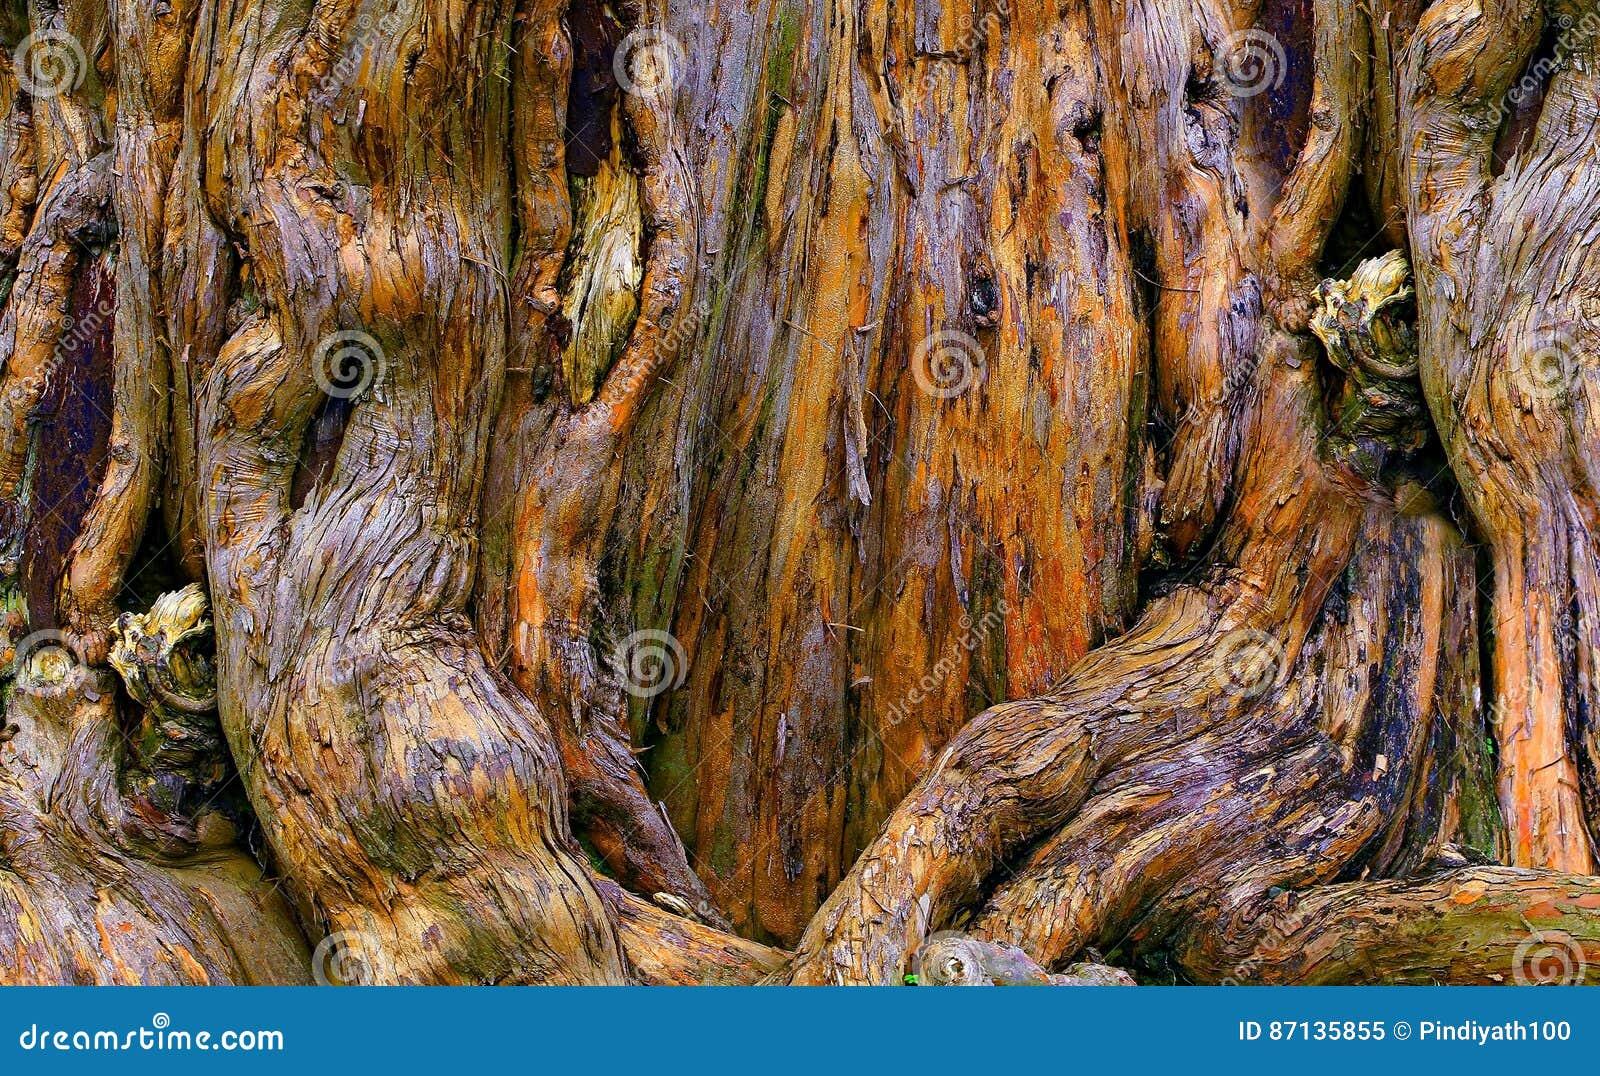 Decaying banyan tree roots